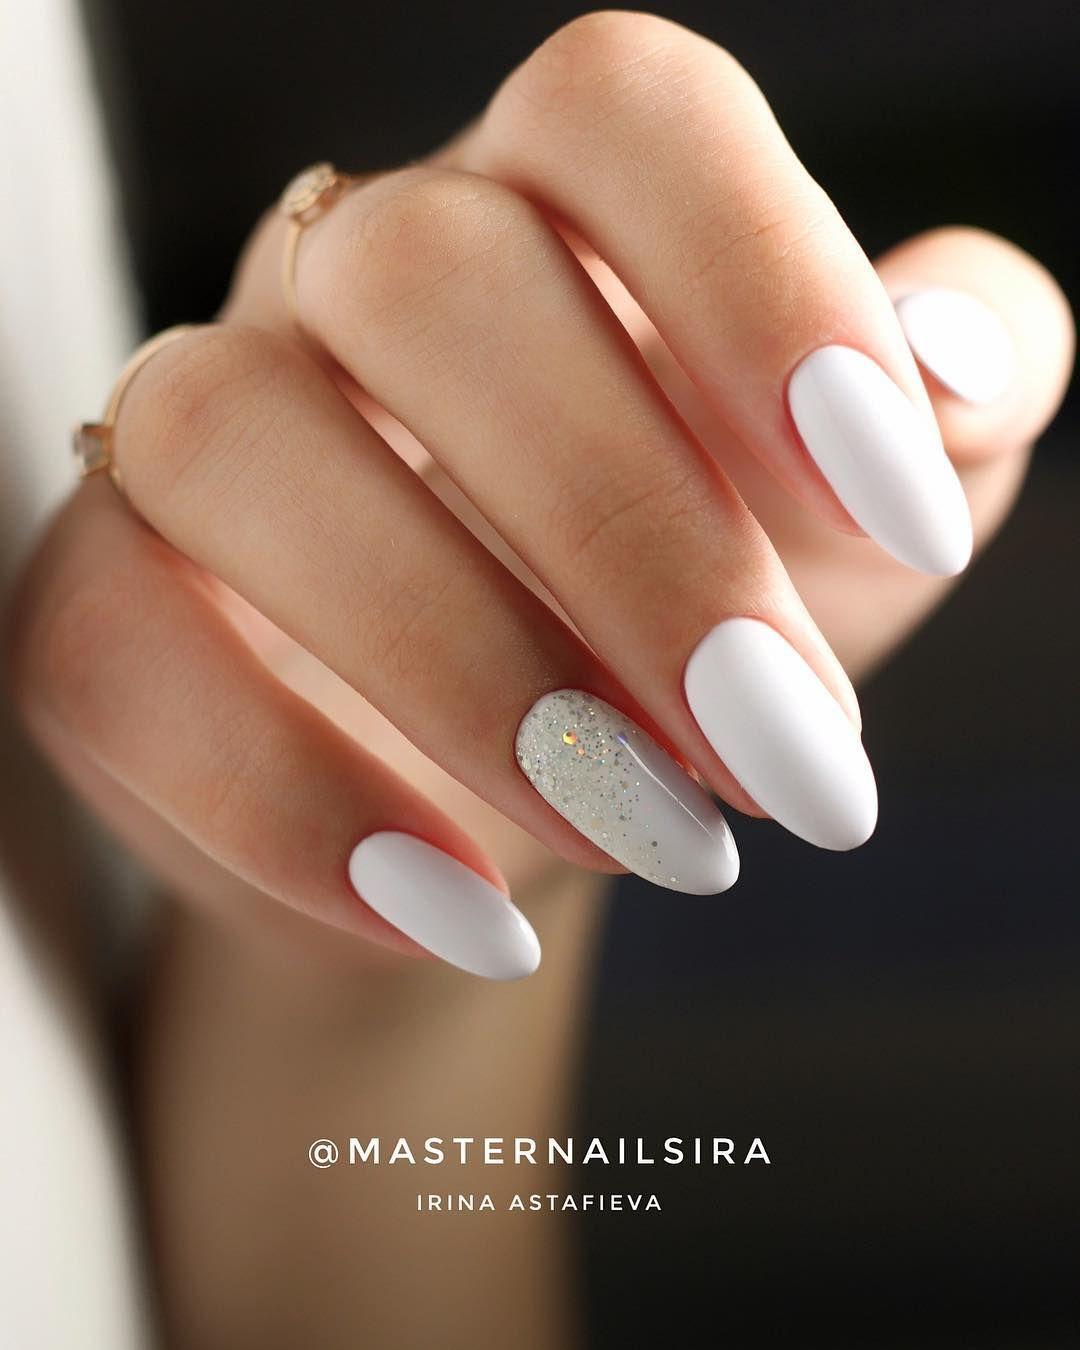 48 Stylish Acrylic White Nail Art Designs And Ideas Gelove Nehty Dlouhe Nehty Nehty